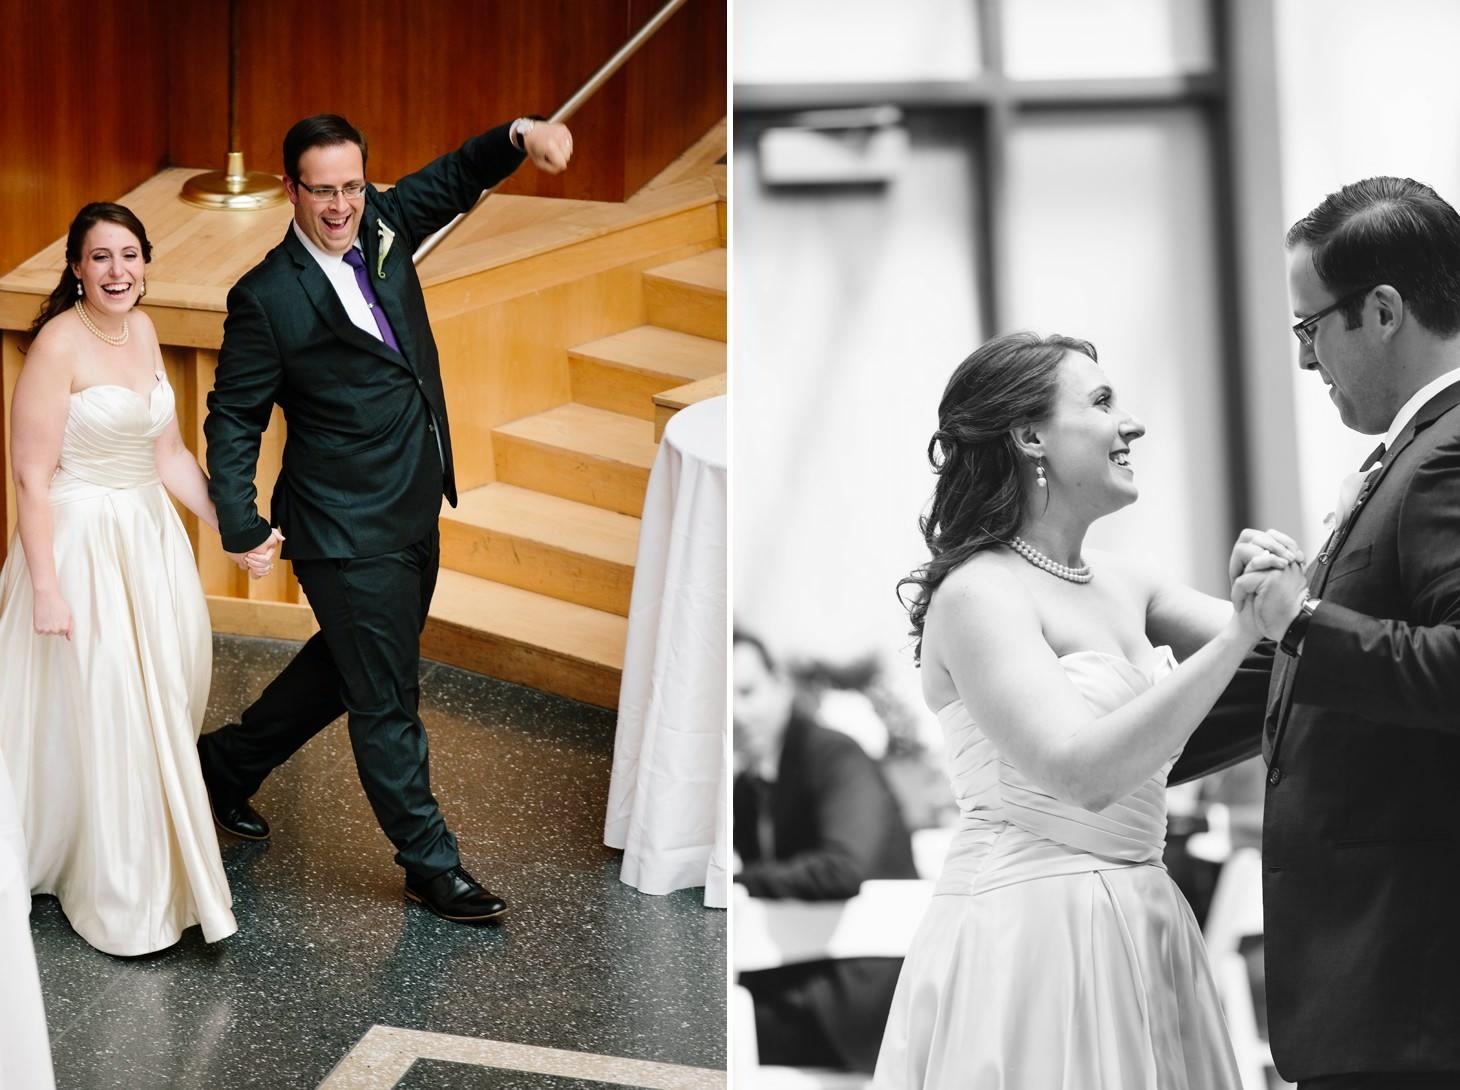 051-nyc-wedding-photographer-hoboken-waterfront-wedding-photos-smitten-chickens.jpg